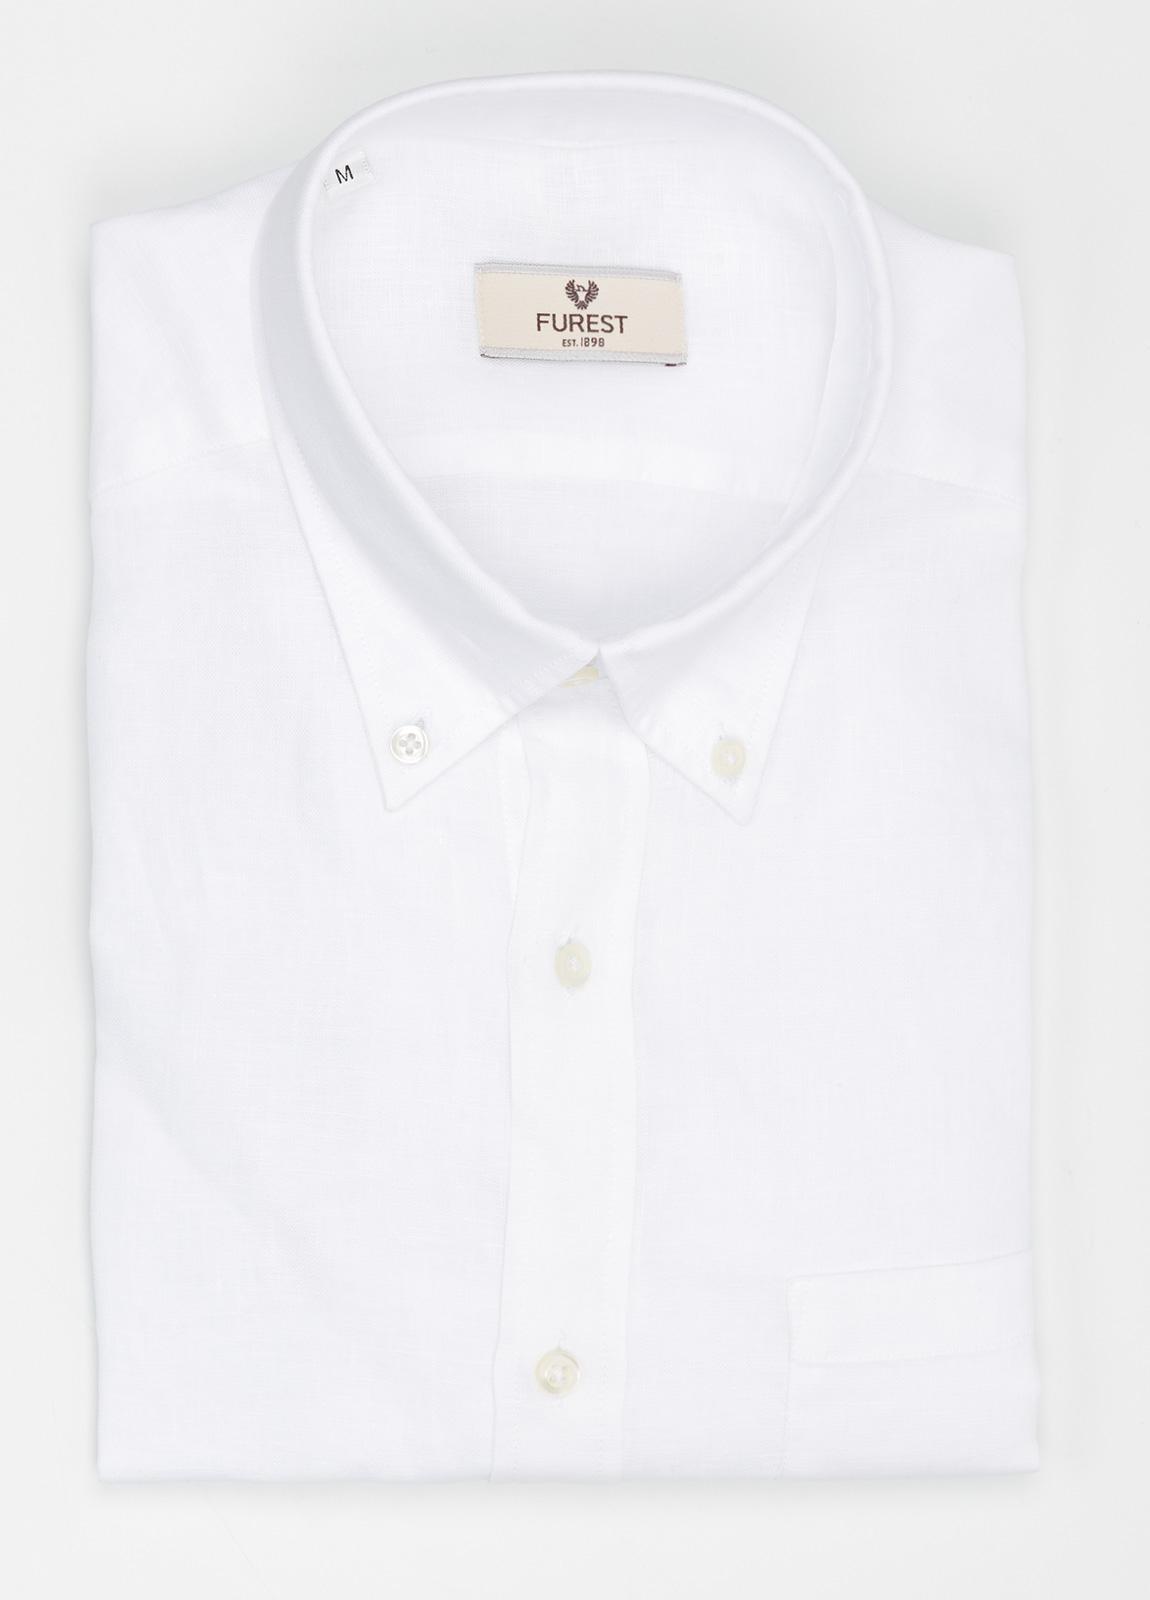 Camisa Leisure Wear REGULAR FIT Modelo BOTTON DOWN color blanco. 100% Algodón.